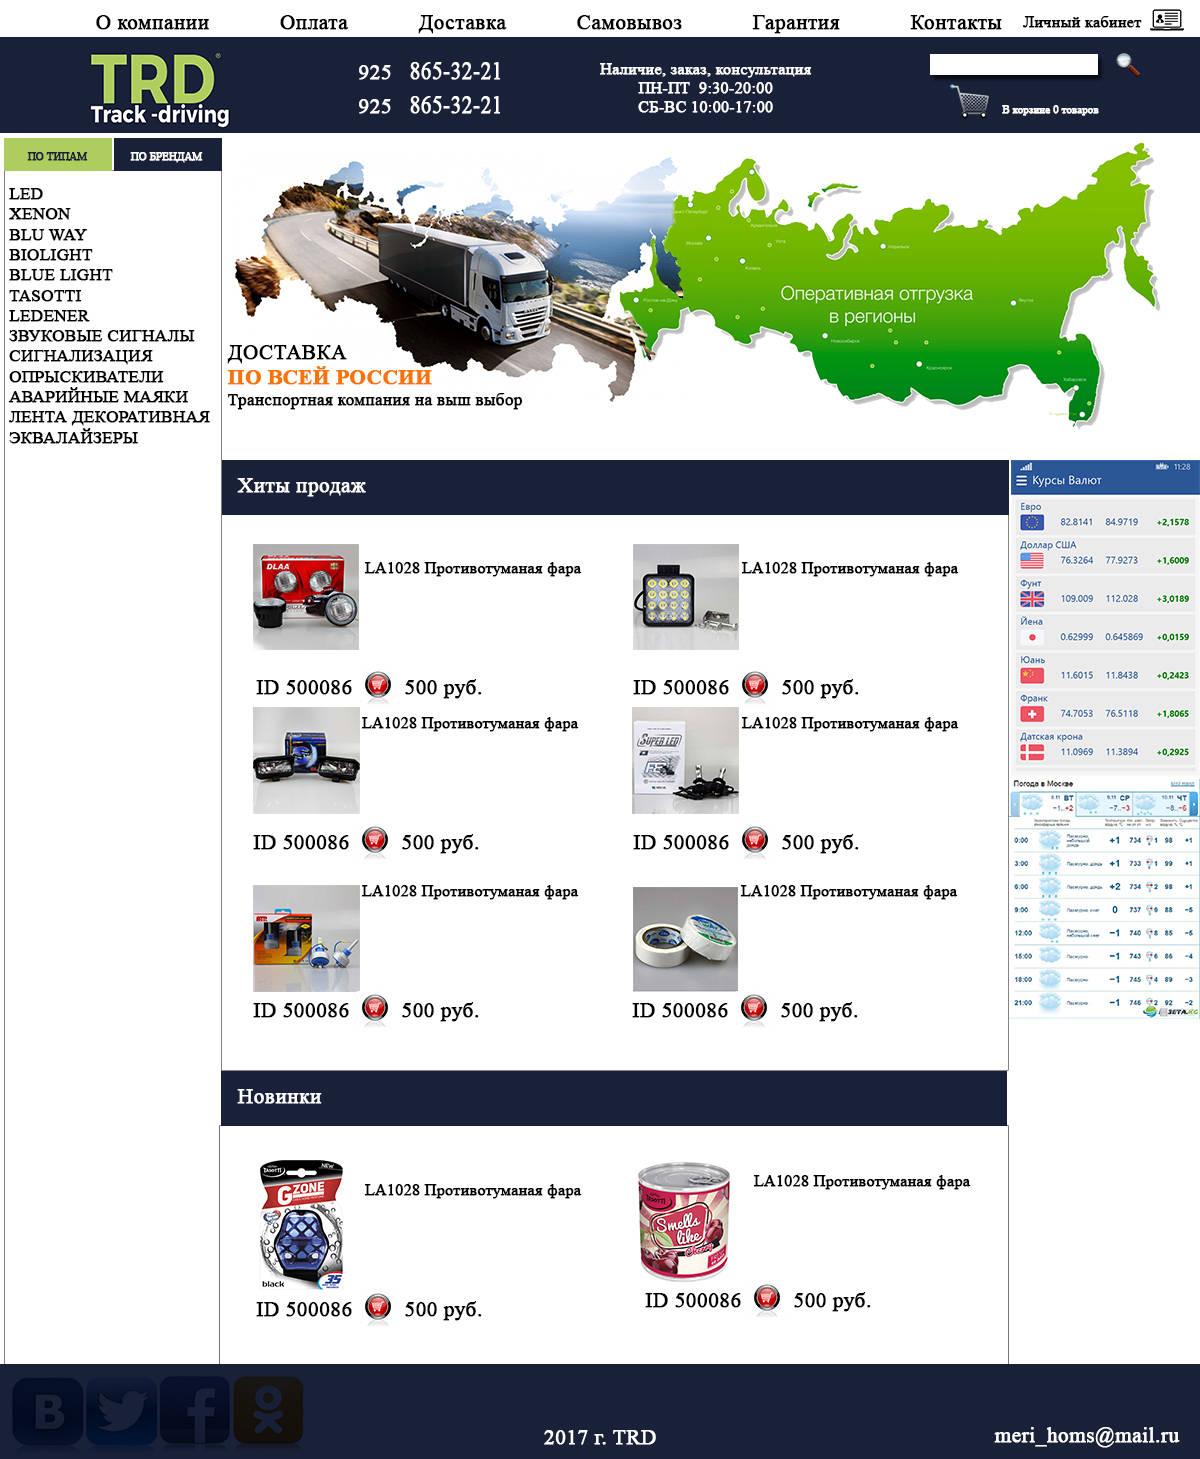 TRD - дизайн сайта